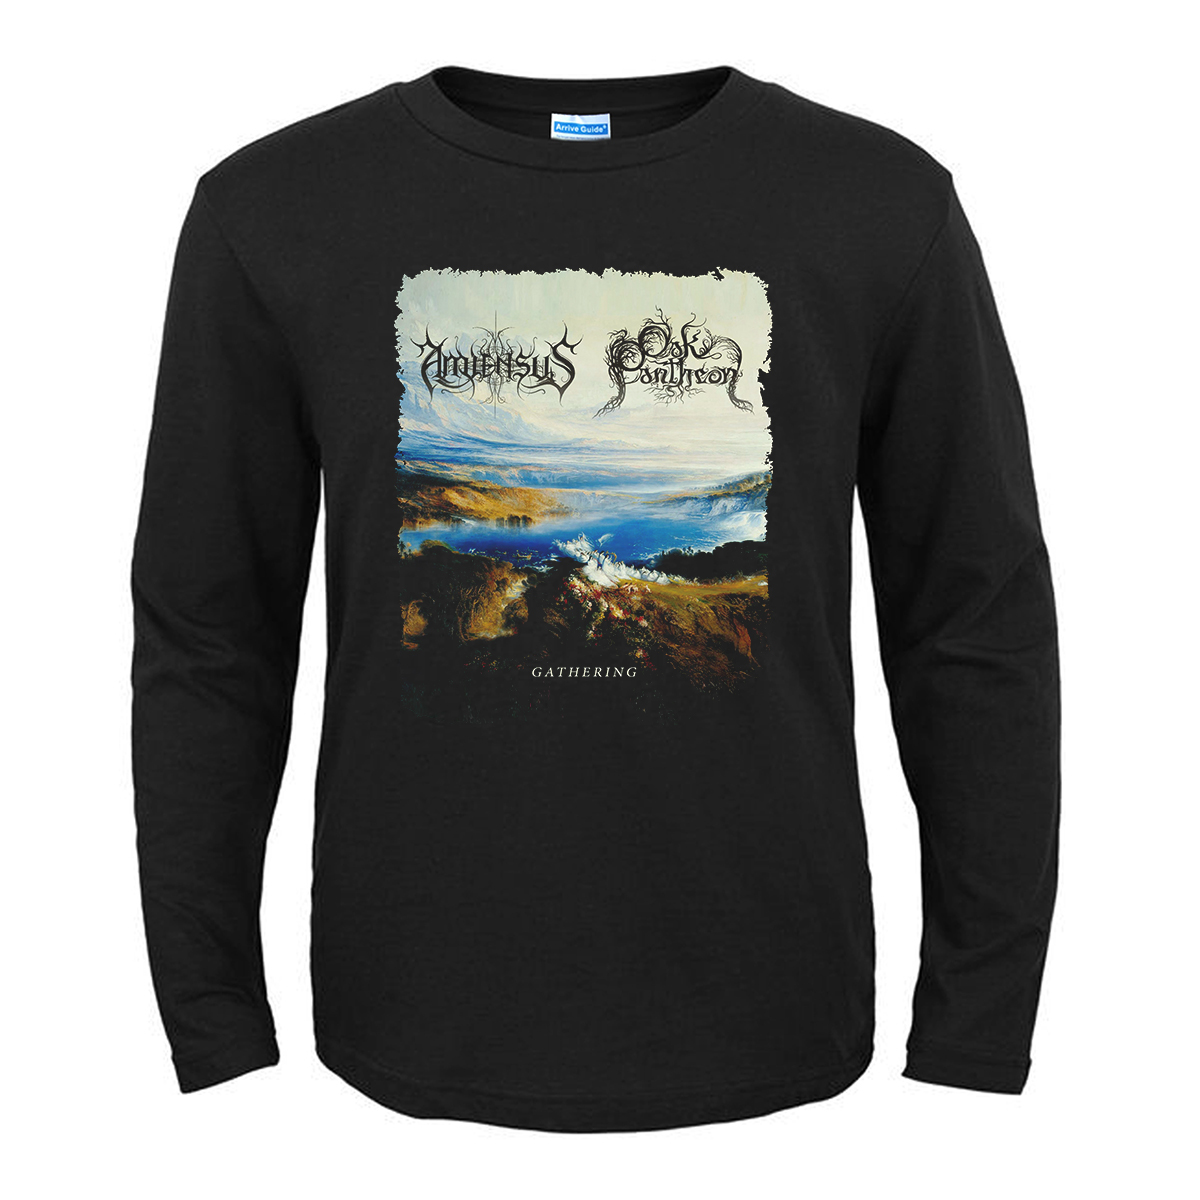 Collectibles T-Shirt Amiensus Oak Pantheon Gathering